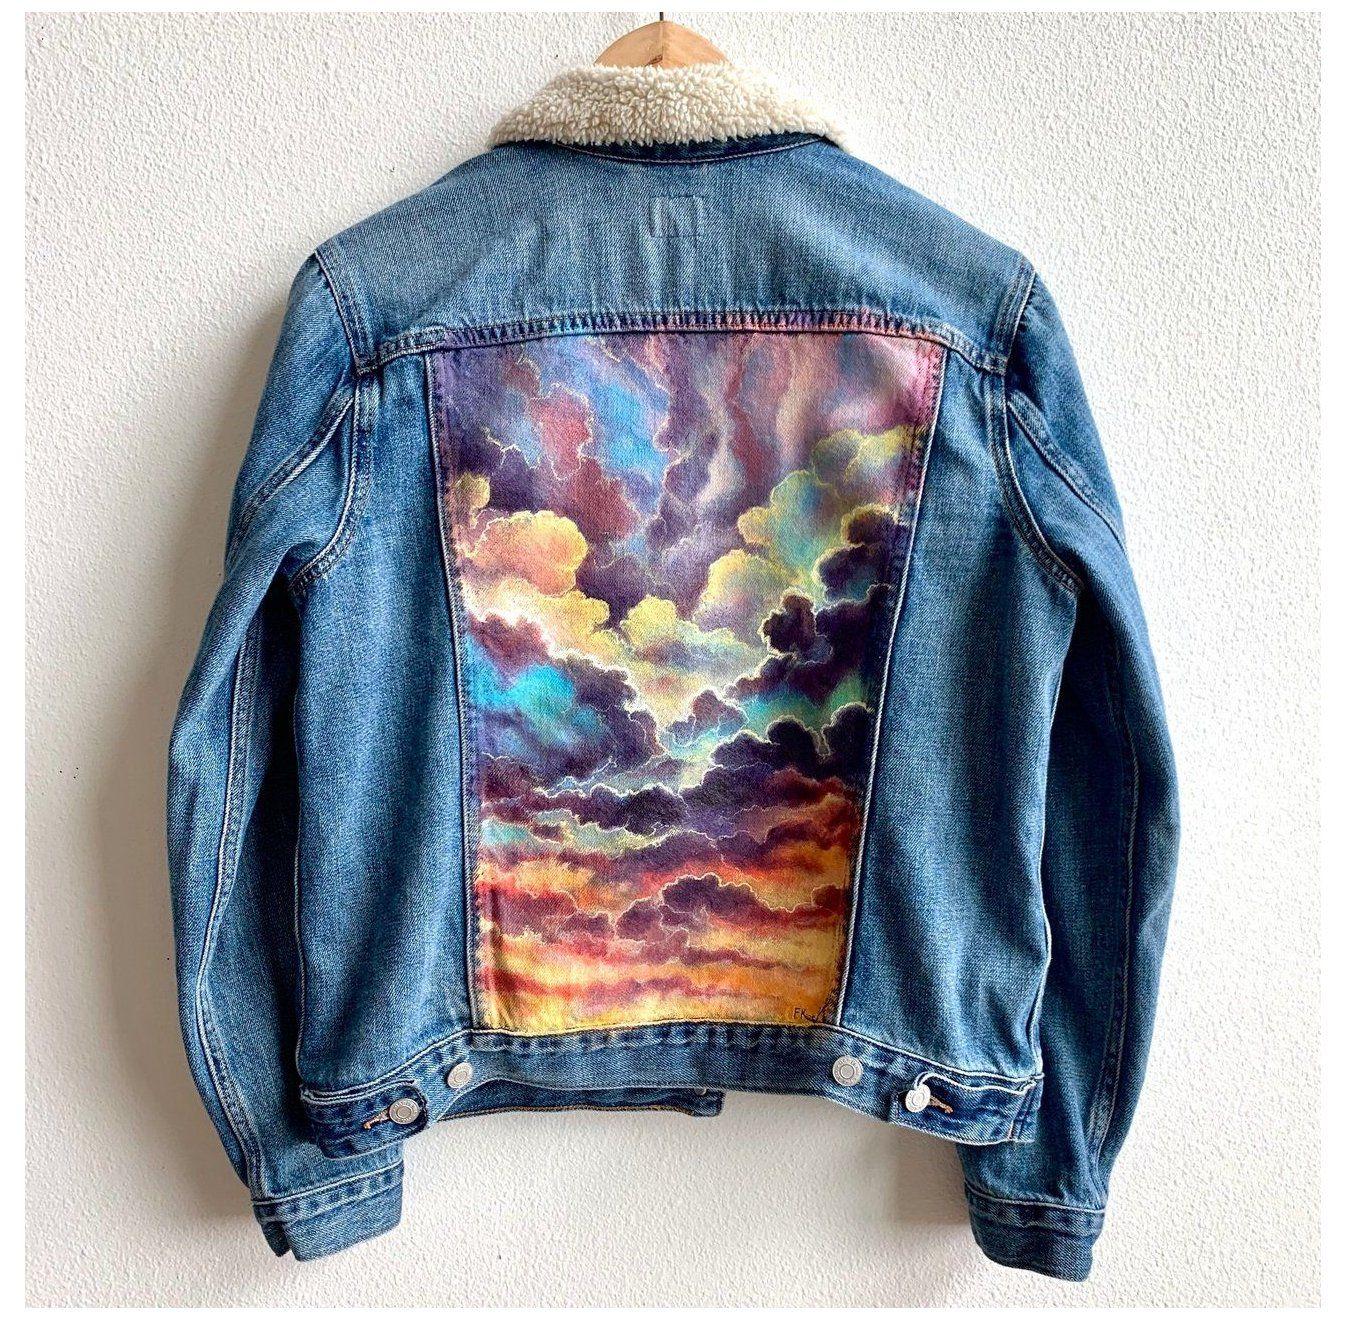 Colorbyfeliks Original Jean Jacket Painting Women S Size Large Painted Jean Jacket Sunset Paintedjeanjacke In 2021 Painted Clothes Diy Diy Denim Jacket Diy Jacket [ 1320 x 1346 Pixel ]